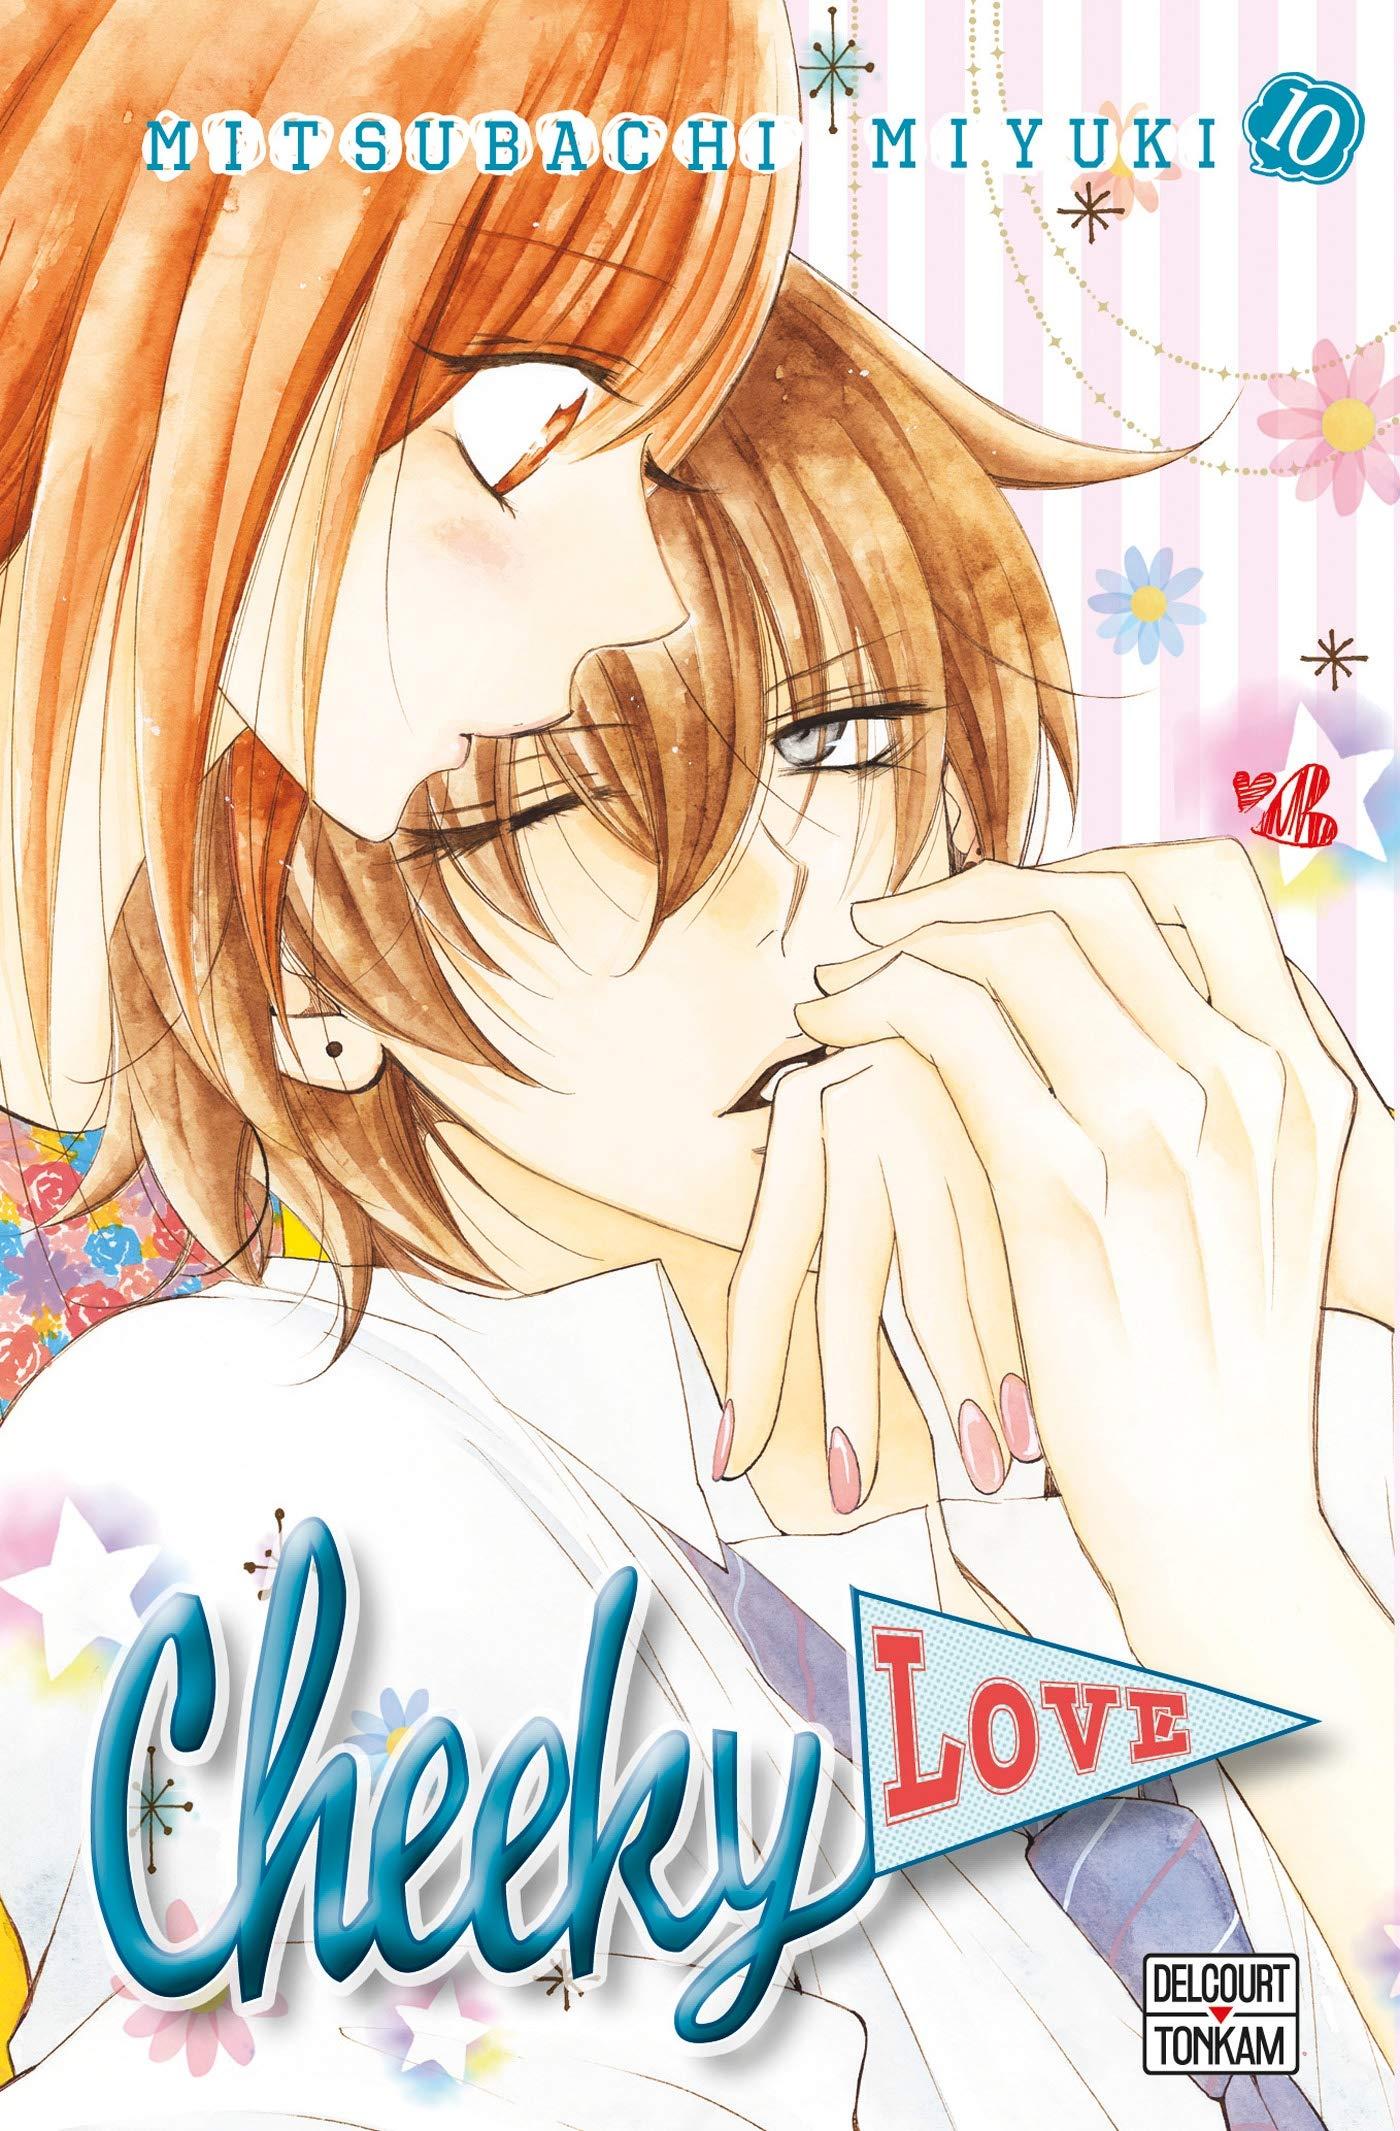 Cheeky love 10